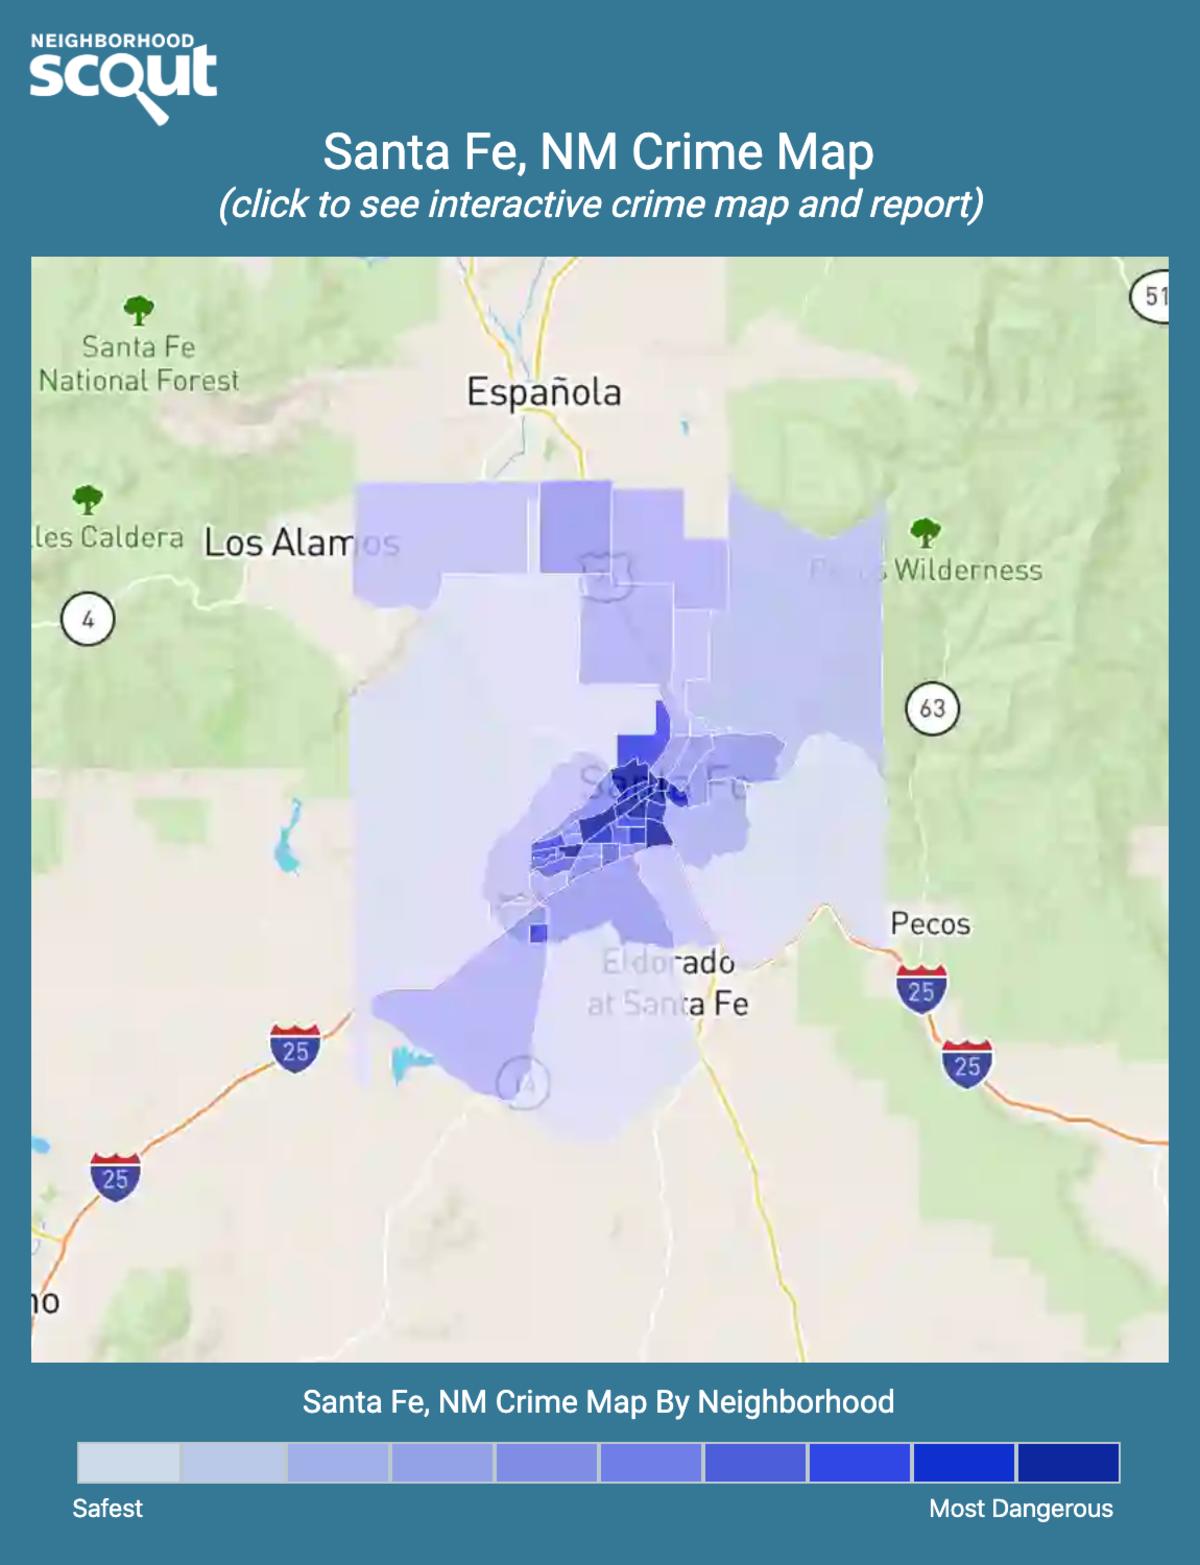 Santa Fe, New Mexico crime map